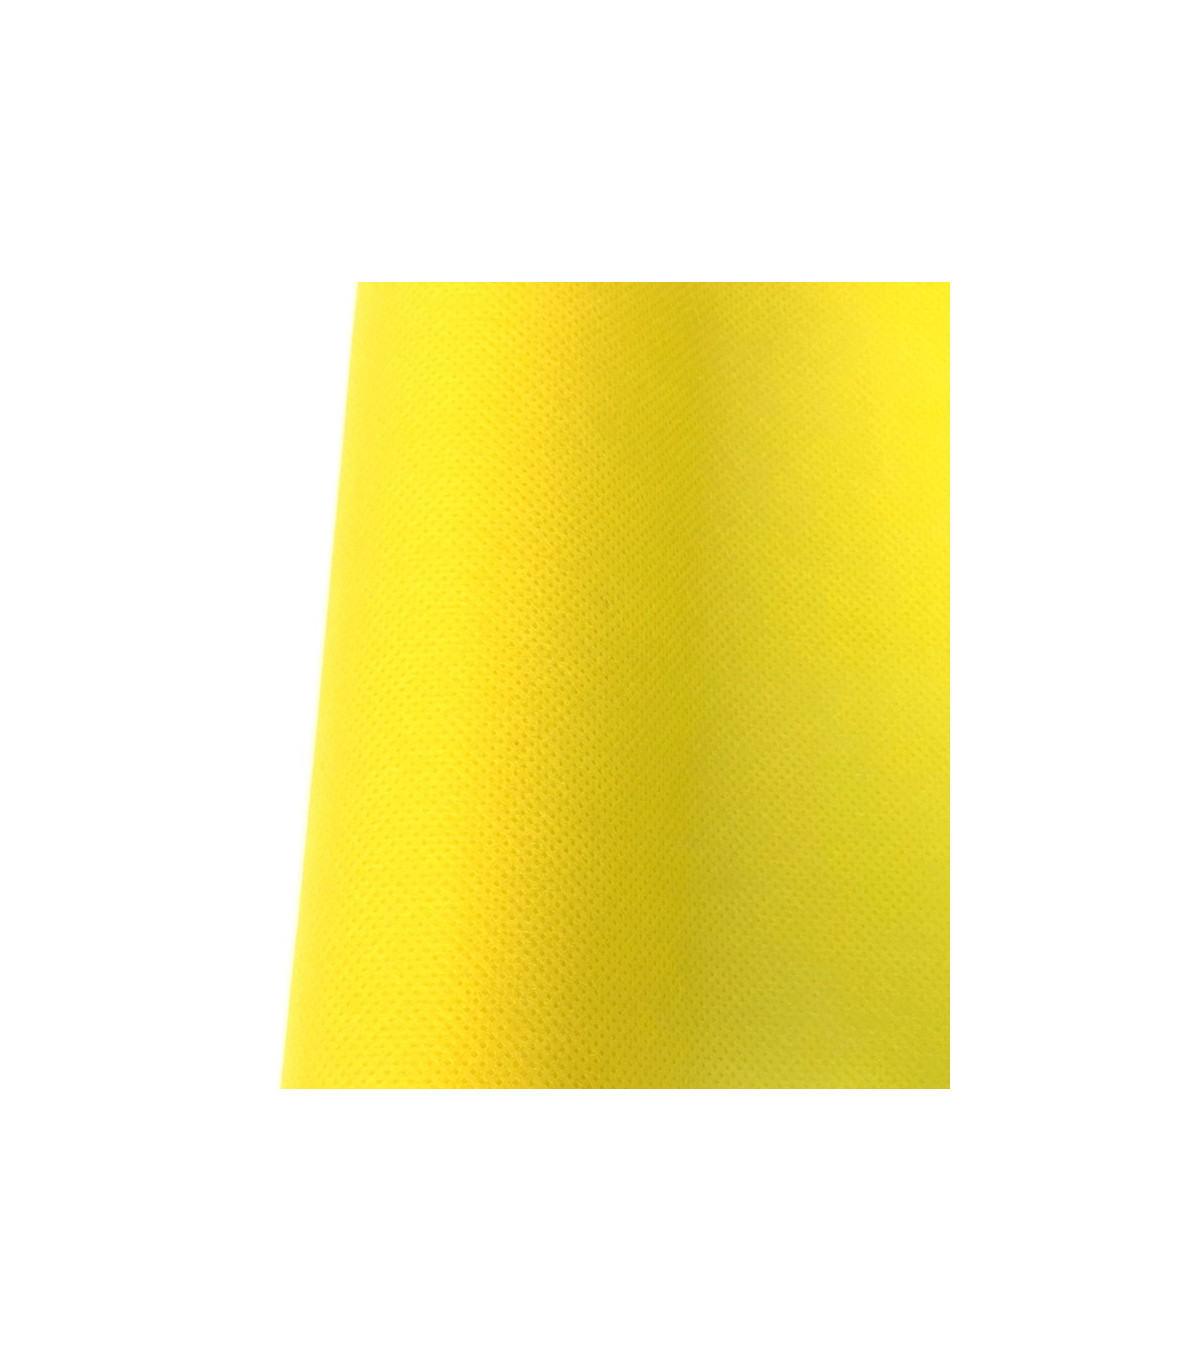 Chemin De Table Intisse Jaune Citron Uni Couleur Jaune